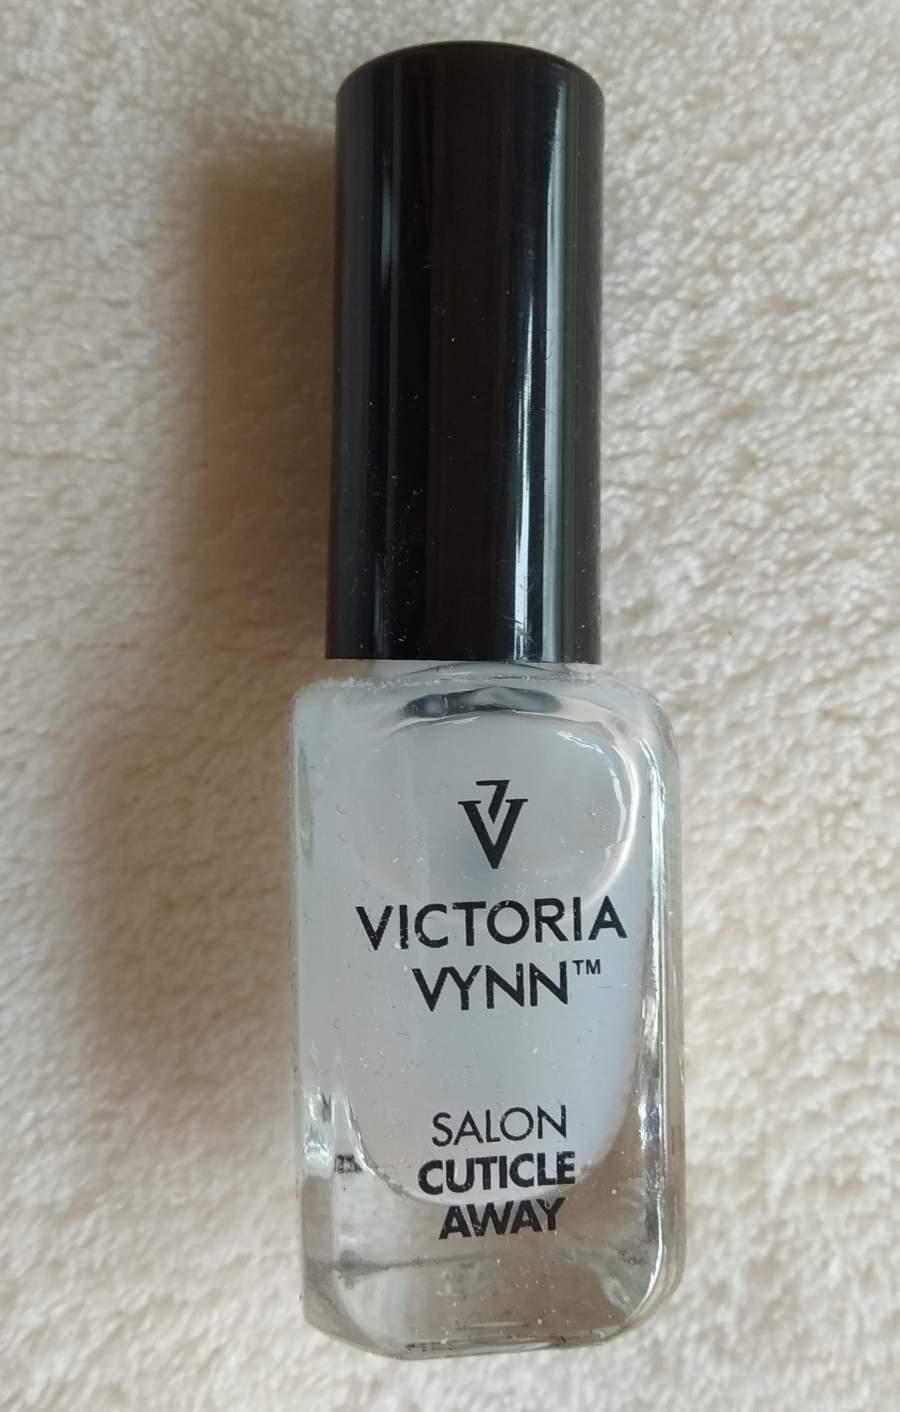 Victoria Vynn - Removedor de Cutículas - Cuticle away - 10 ml